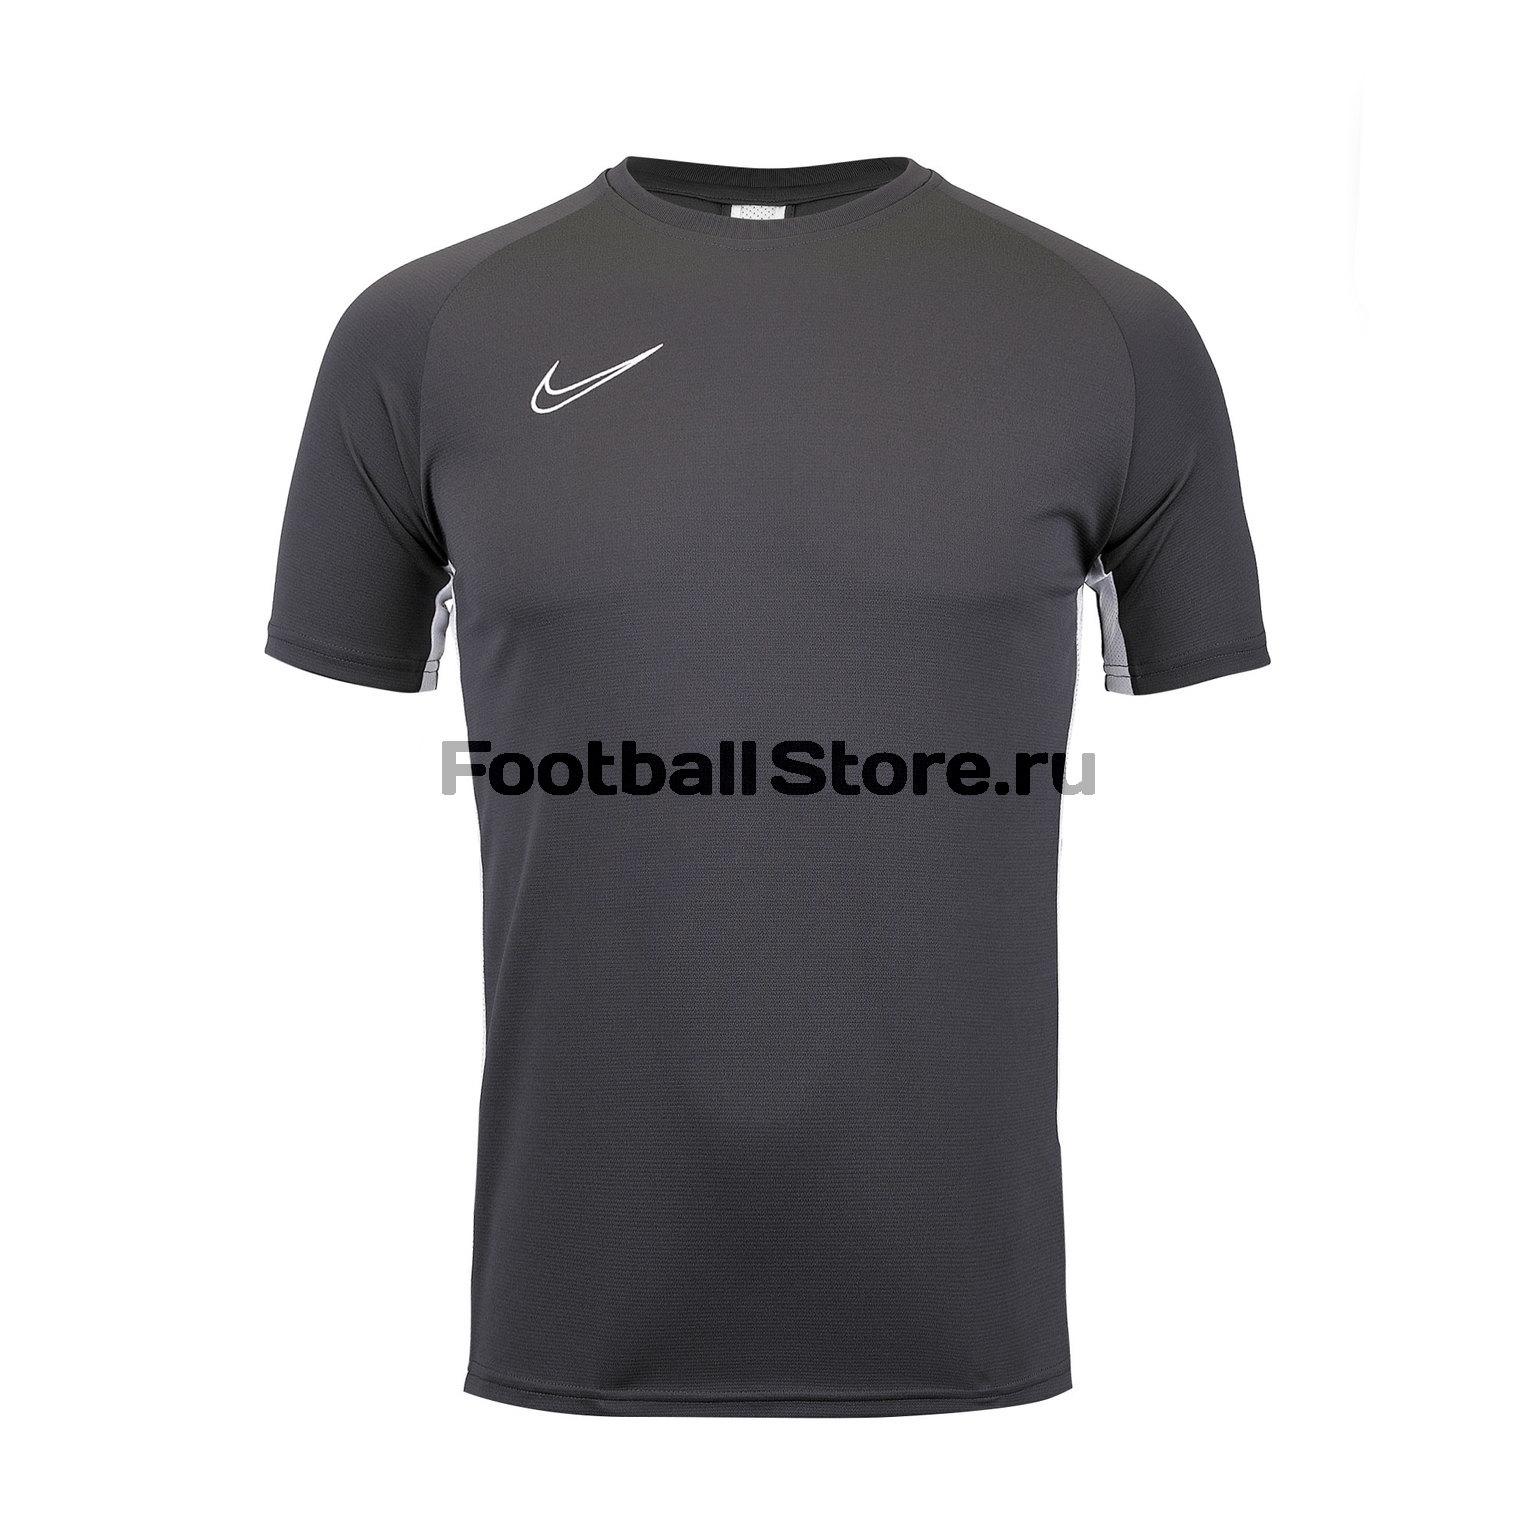 Футболка тренировочная подростковая Nike Dry Academy19 AJ9261-060